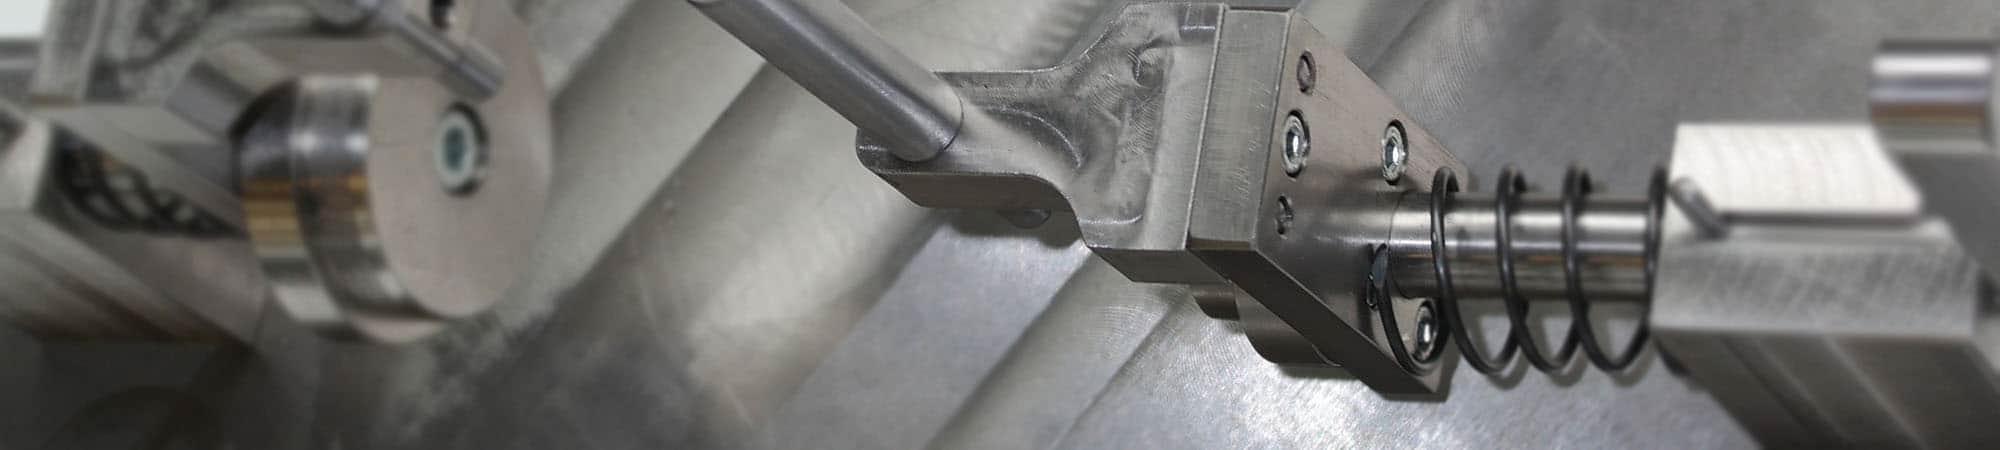 Maschere Saldobrasatura in acciaio Inox